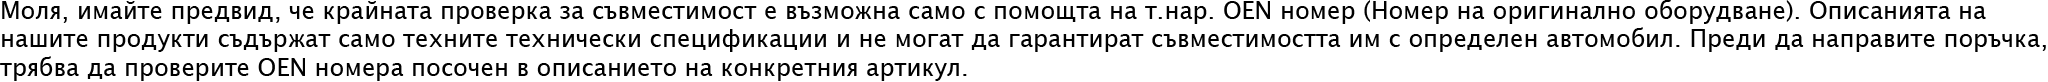 MASTER-SPORT 12 12 1 344 520, 12 12 1 422 087, 12 12 1 704 399, 12 12 1 747 061, 12 12 1 748 002 Запалителна свещ